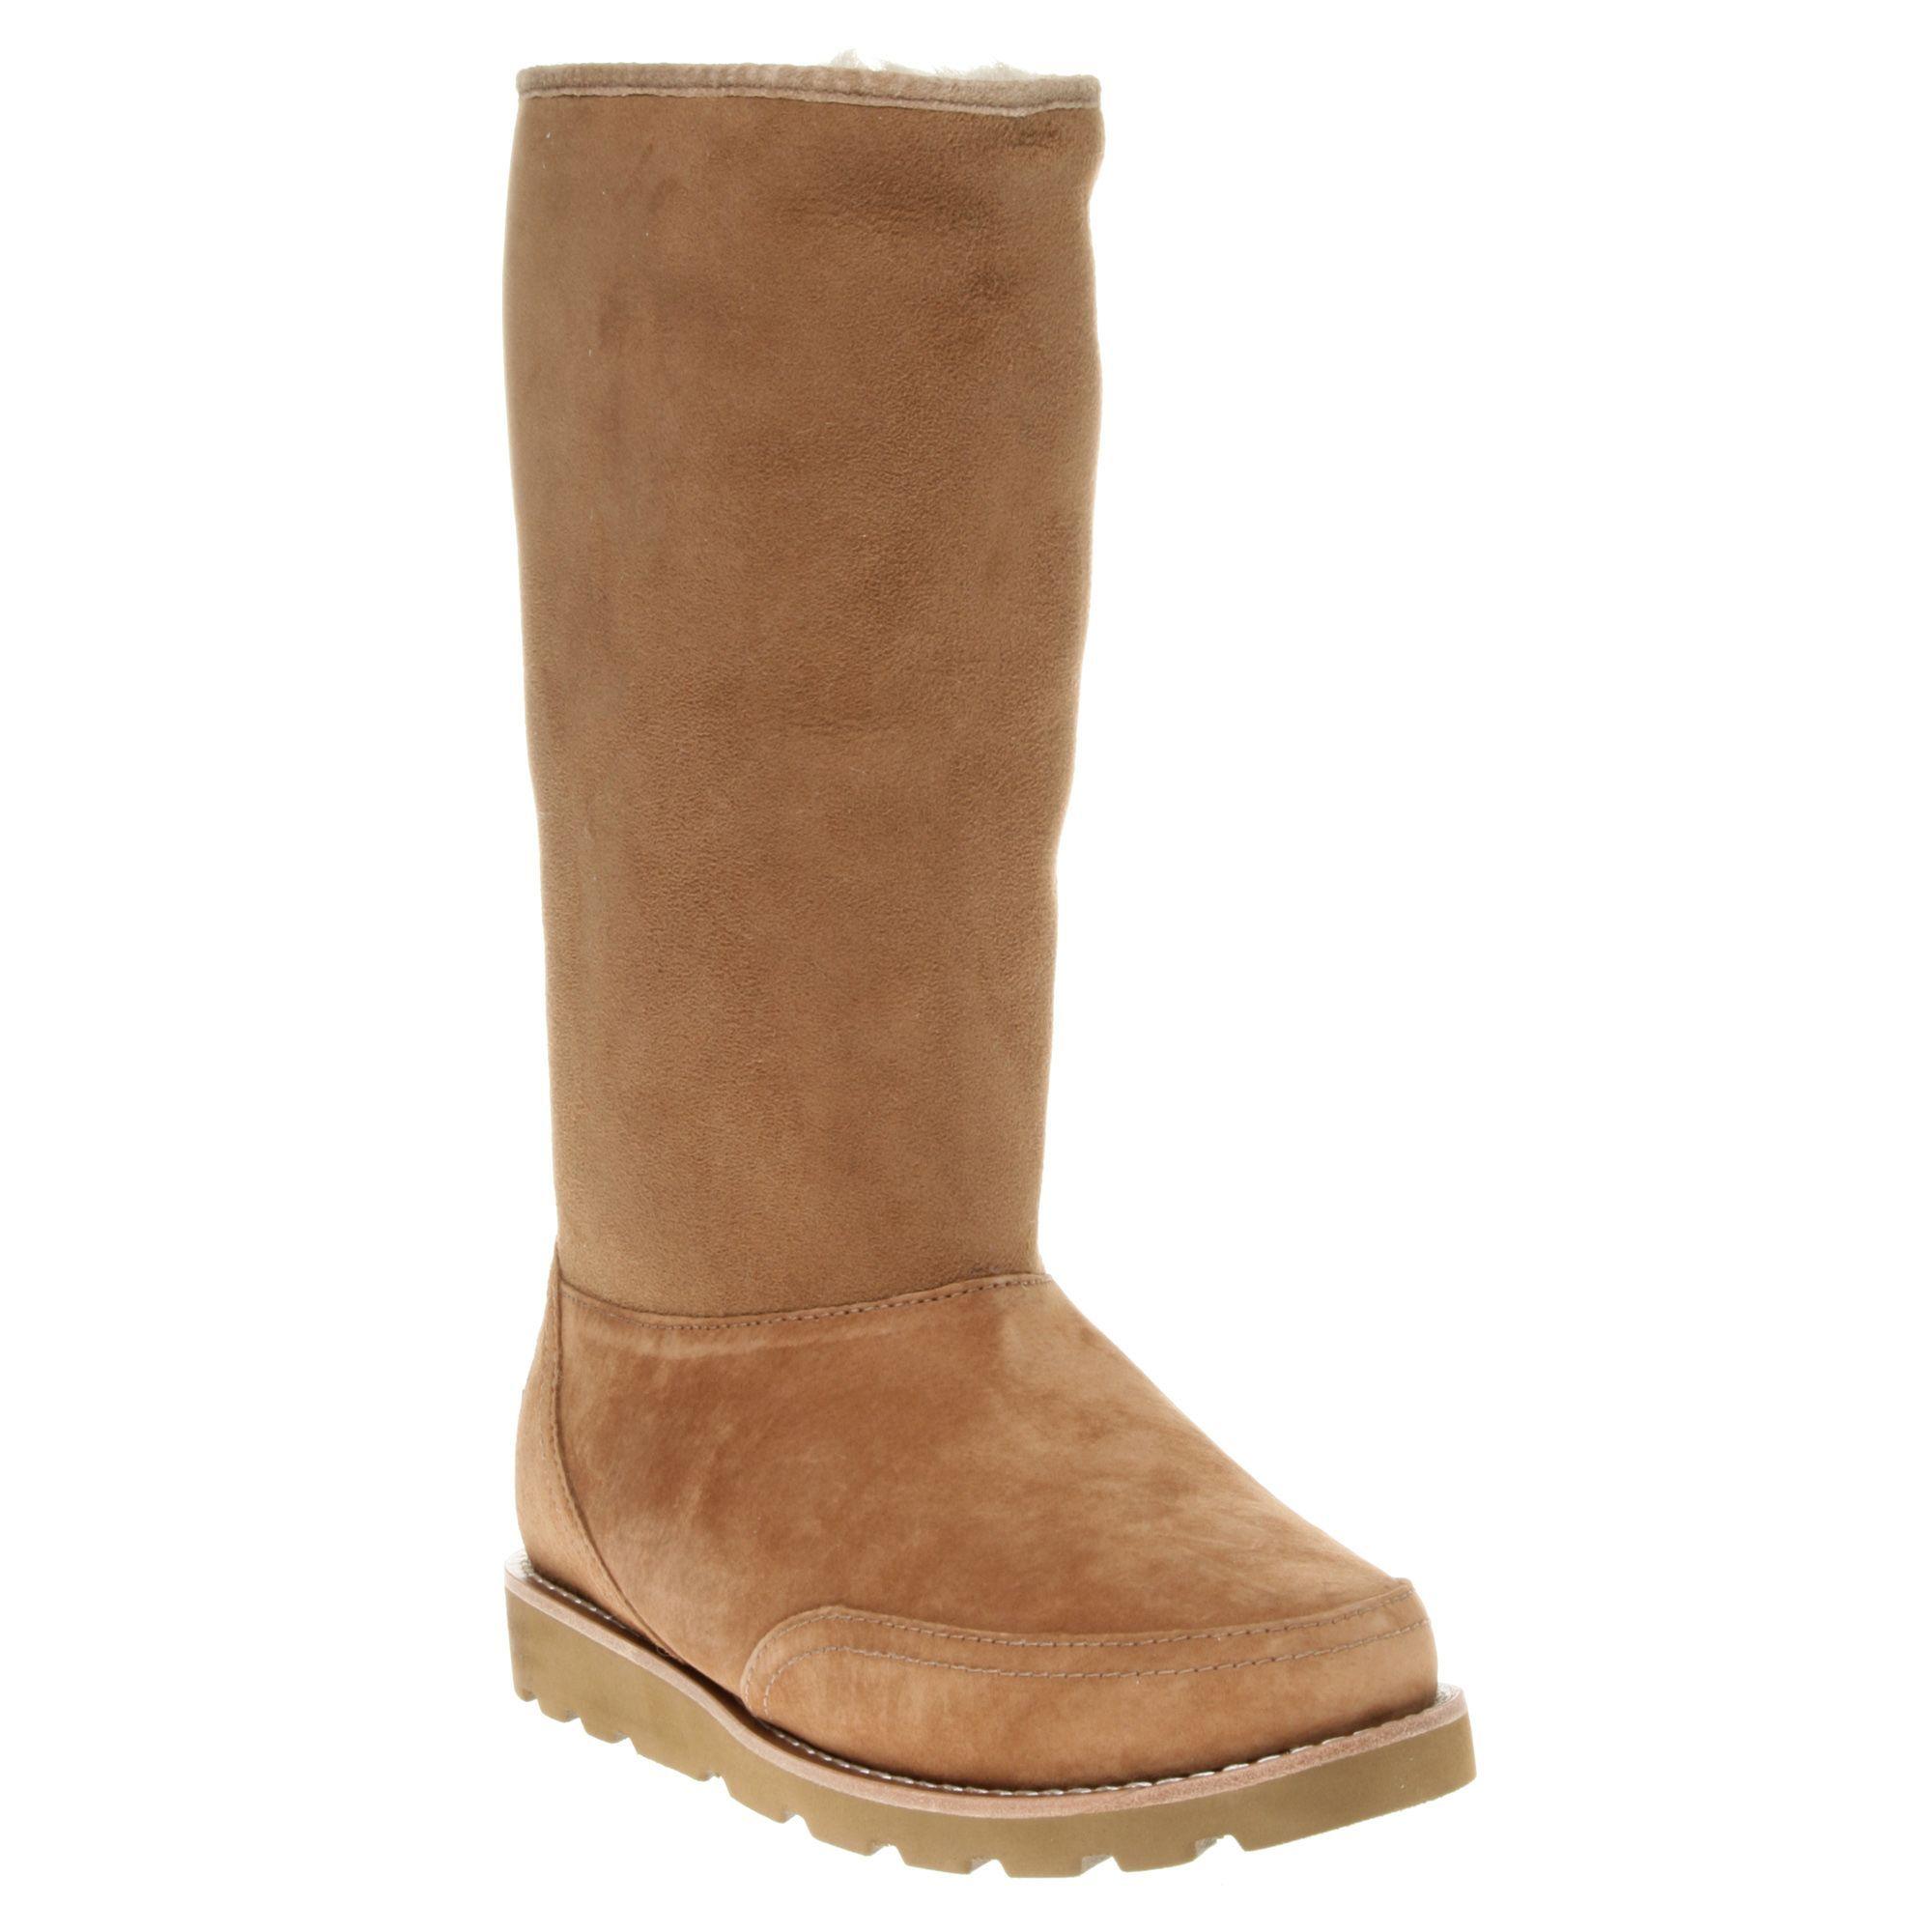 589e8067091 UGG® Australia Elissa Boots - Women - SOLETRADER OUTLET | Footwear ...